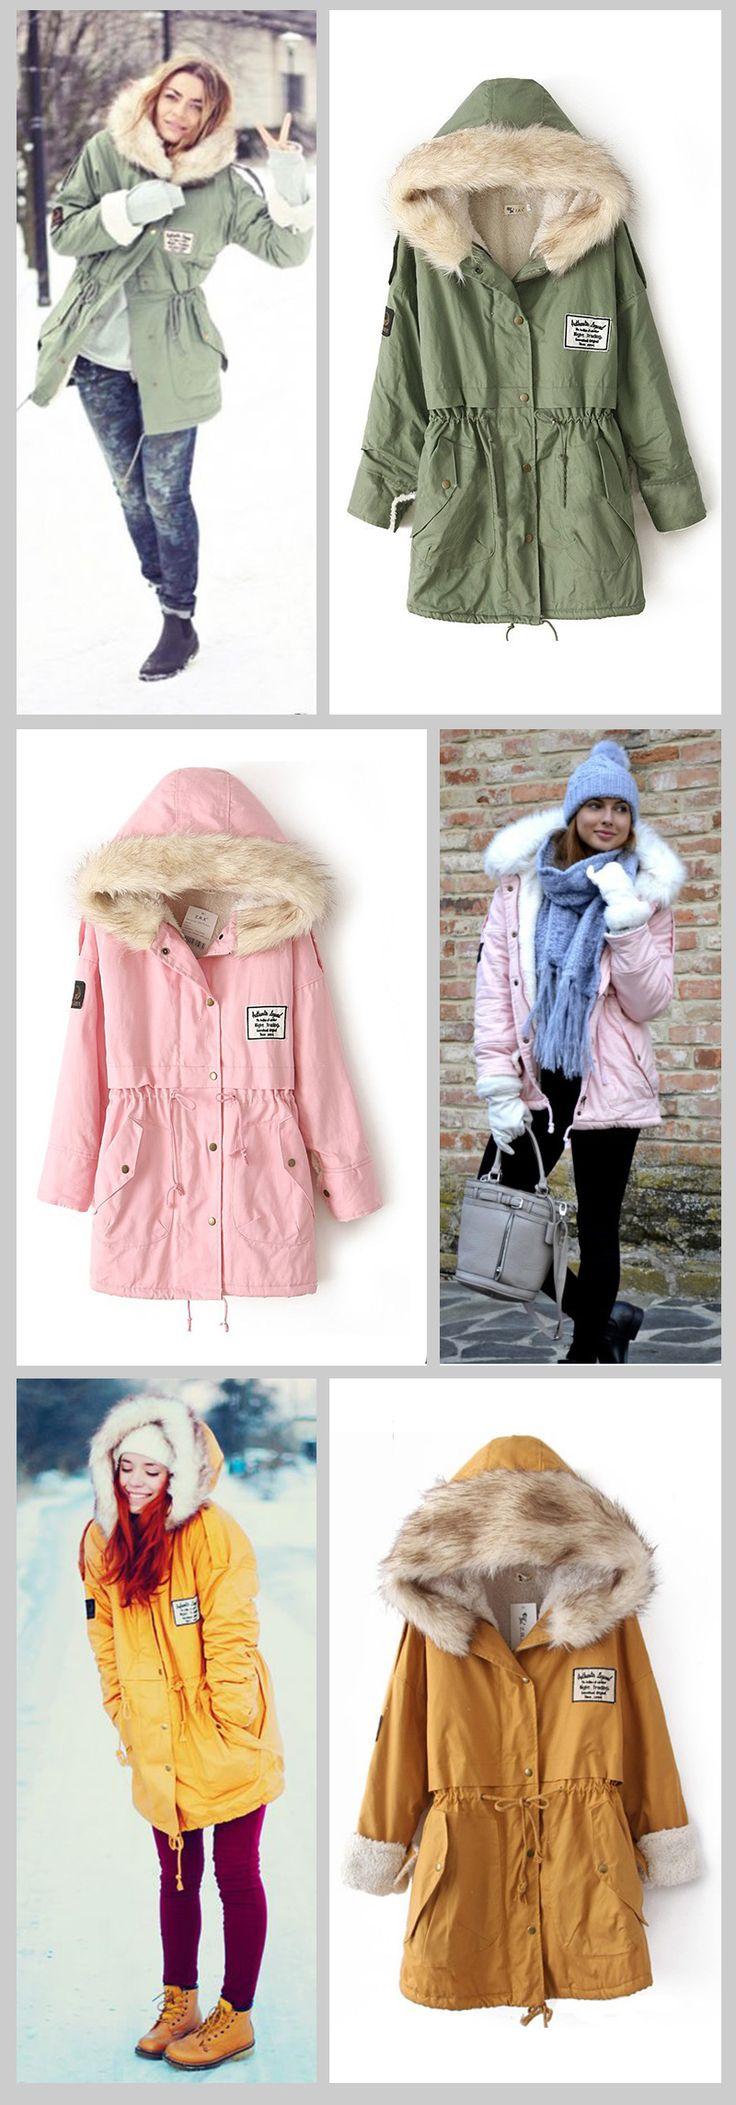 Special offer new 2015 winter coat women clothing coat women outwear; parkas Two wearing hooded fur collar